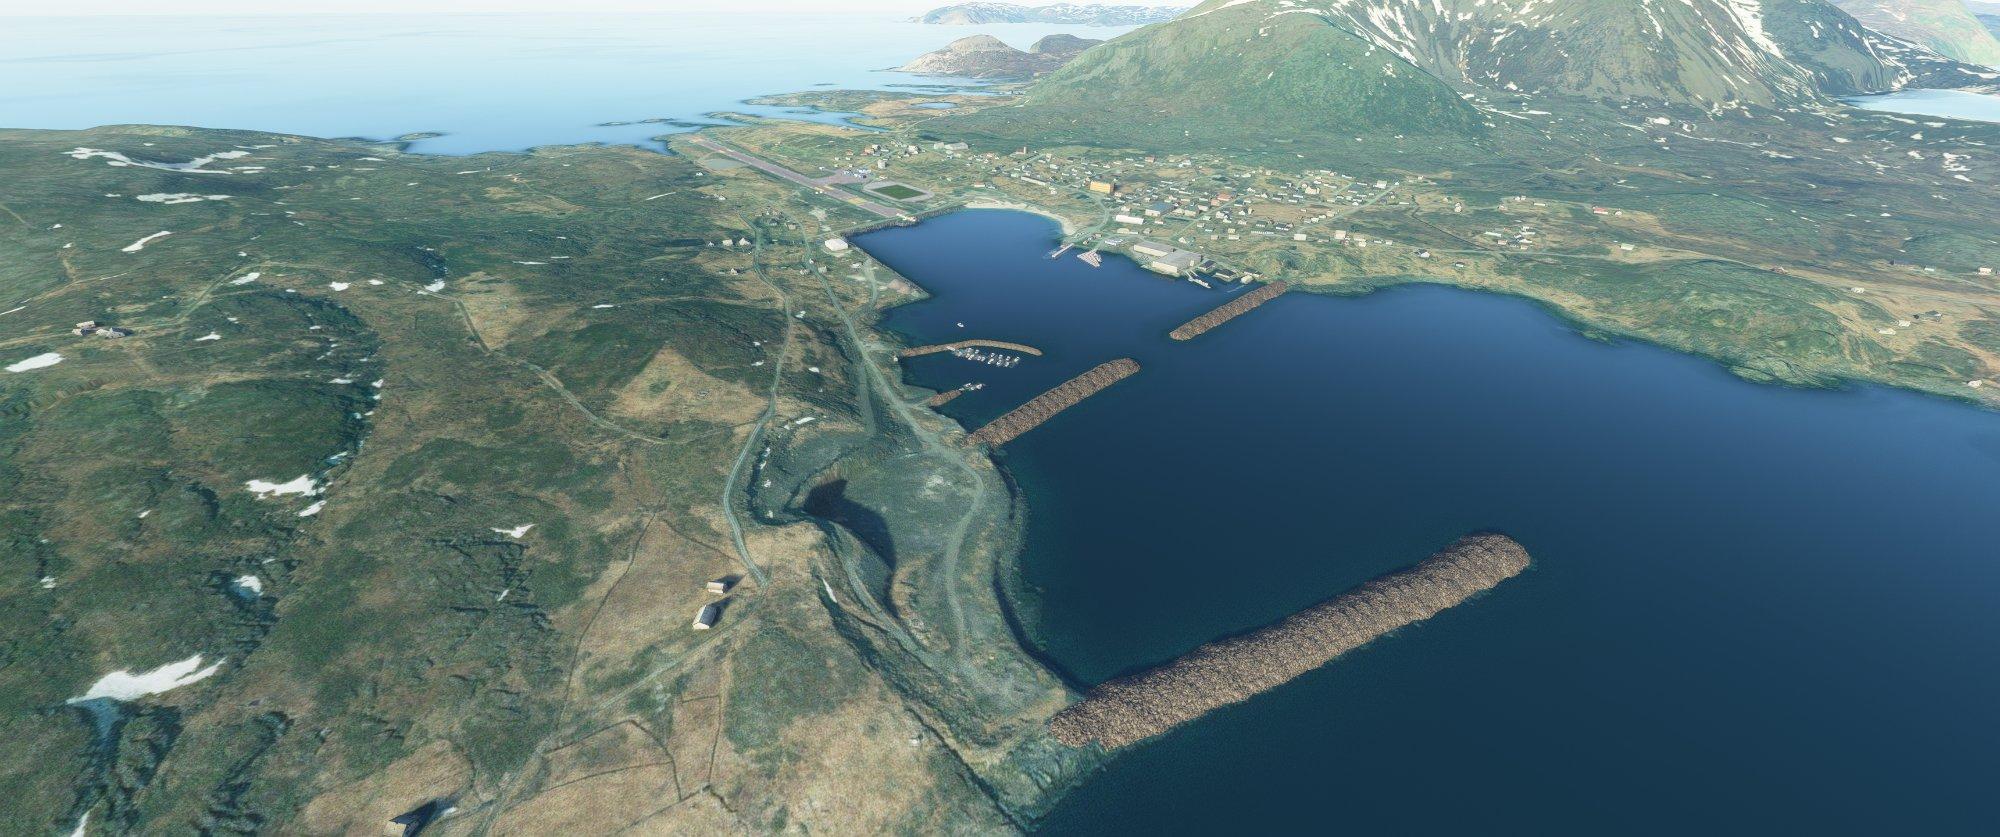 Microsoft Flight Simulator Screenshot 2020.11.20 - 12.54.50.83.jpg